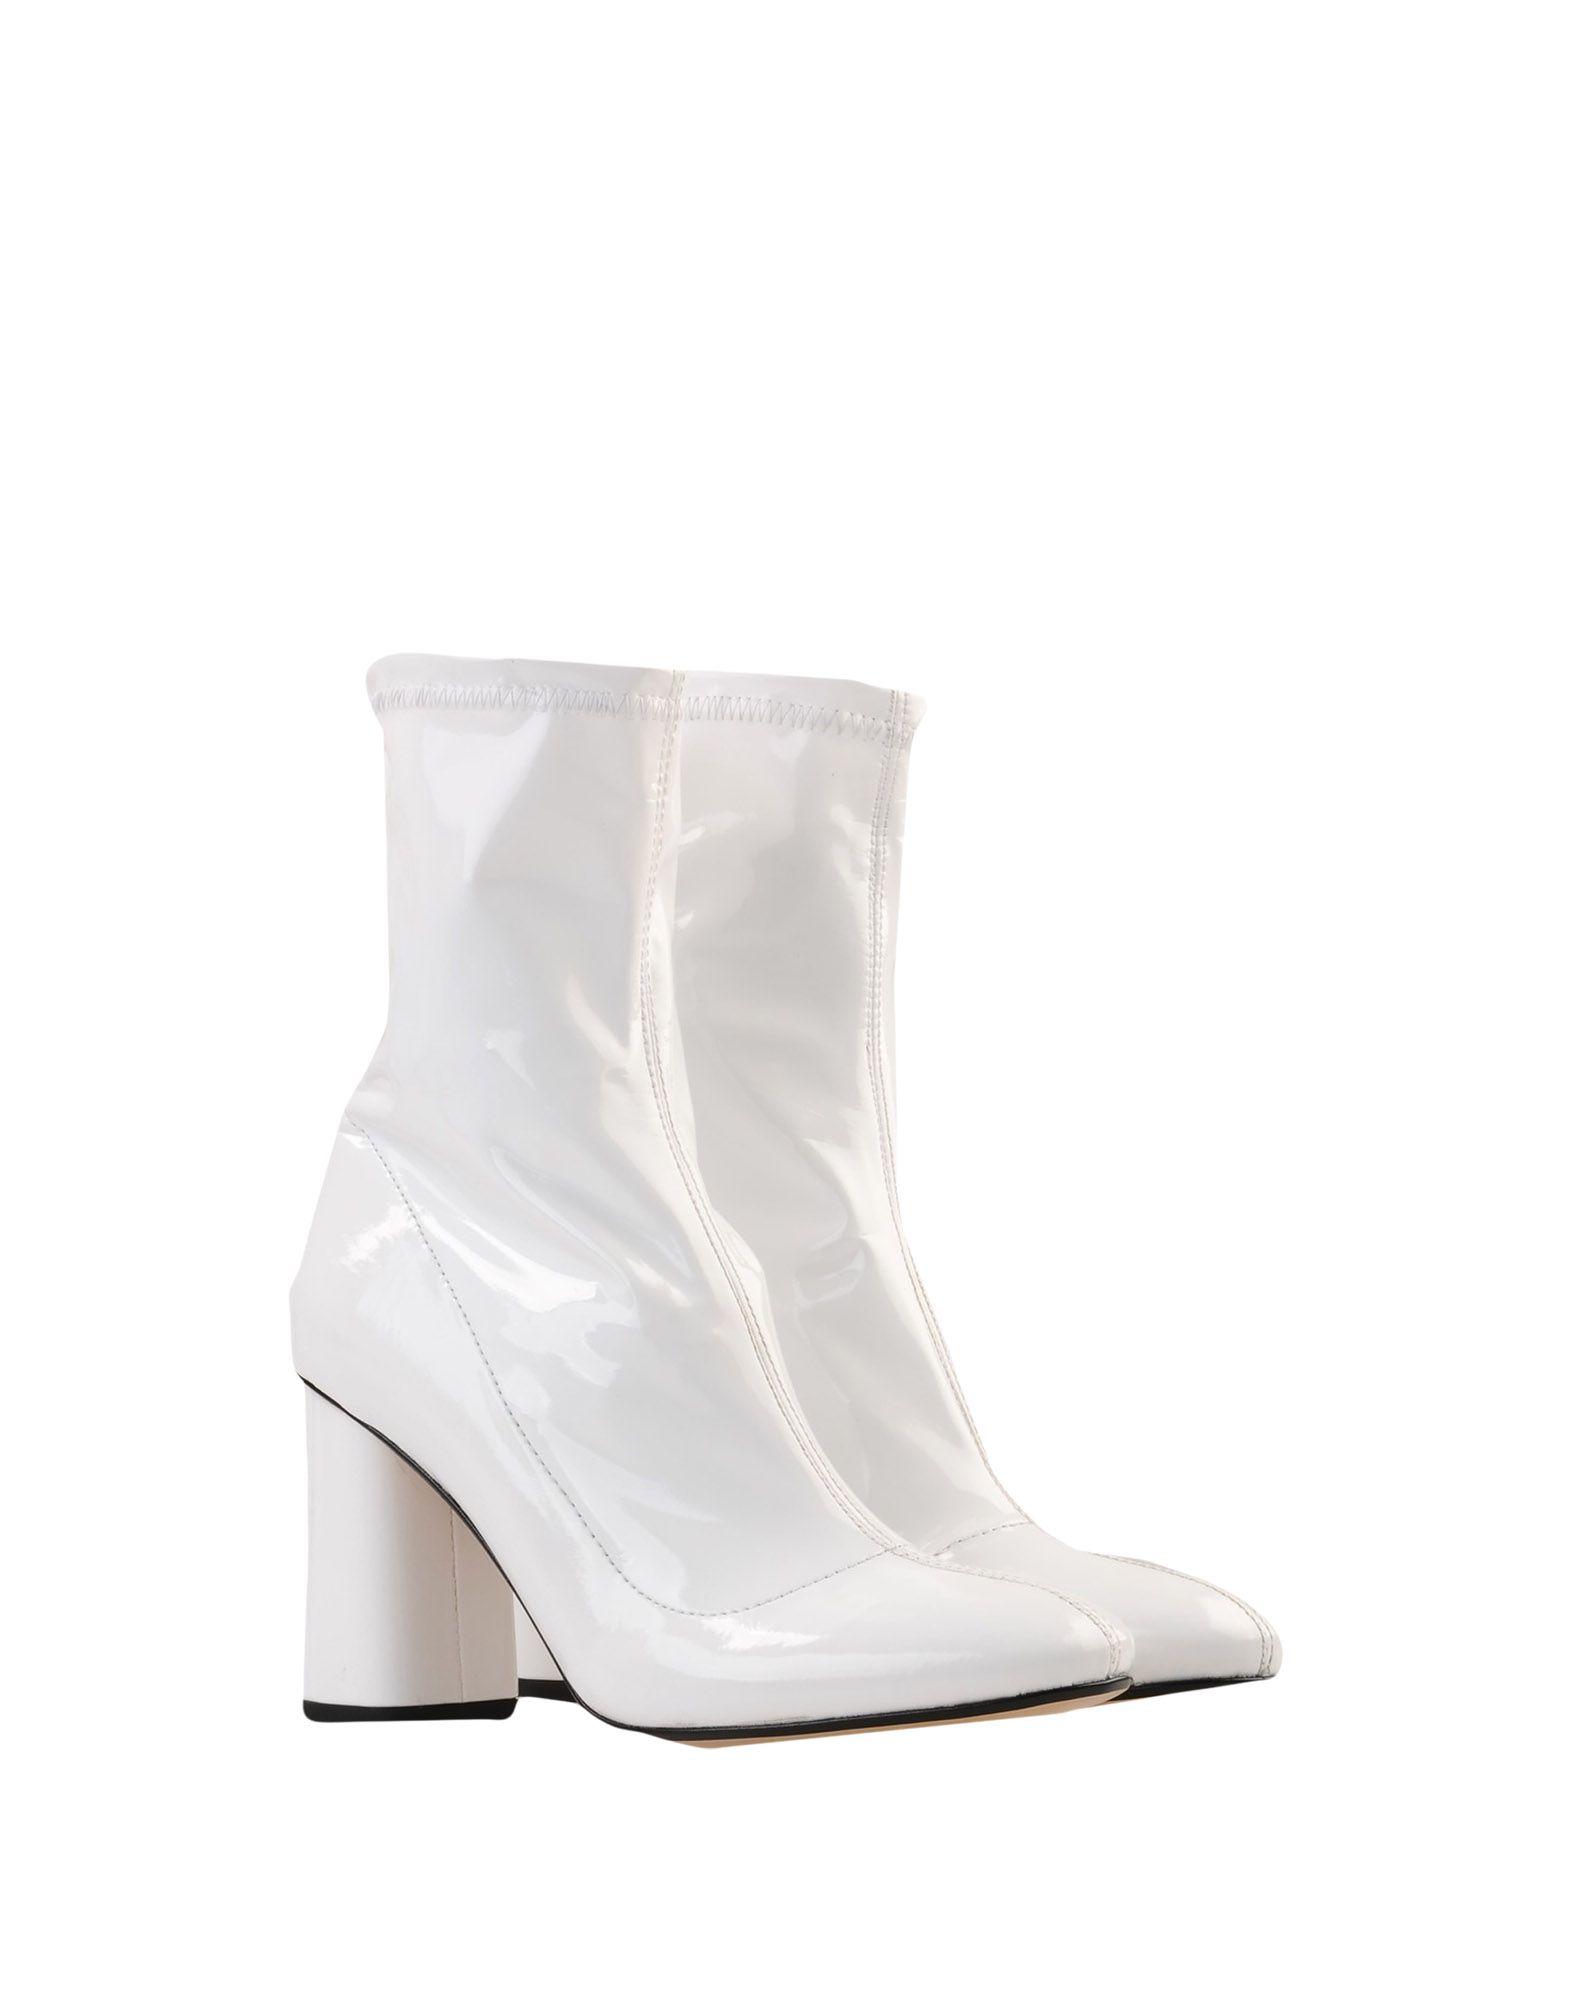 Stilvolle Stiefelette billige Schuhe Fabrizio Chini Stiefelette Stilvolle Damen  11545881NU 77b4d3